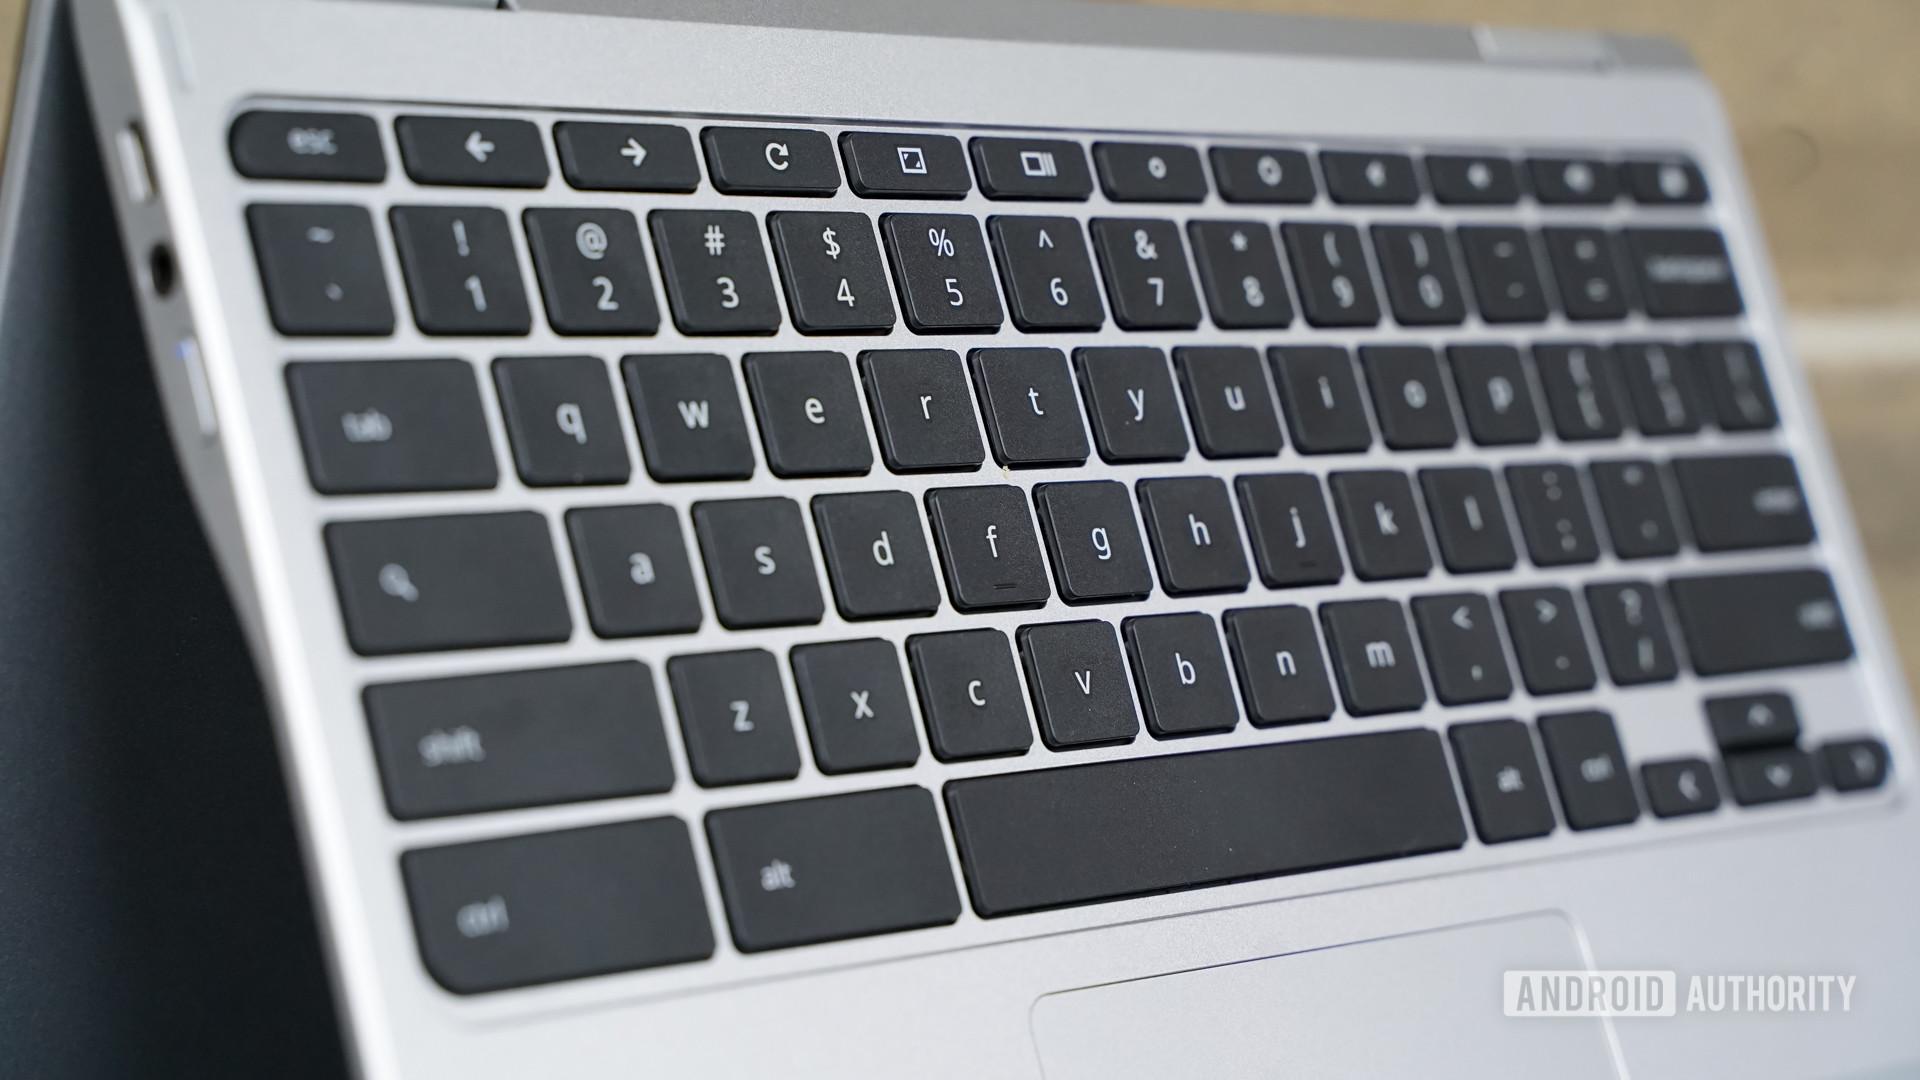 Acer Chromebook Spin 311 keyboard closeup